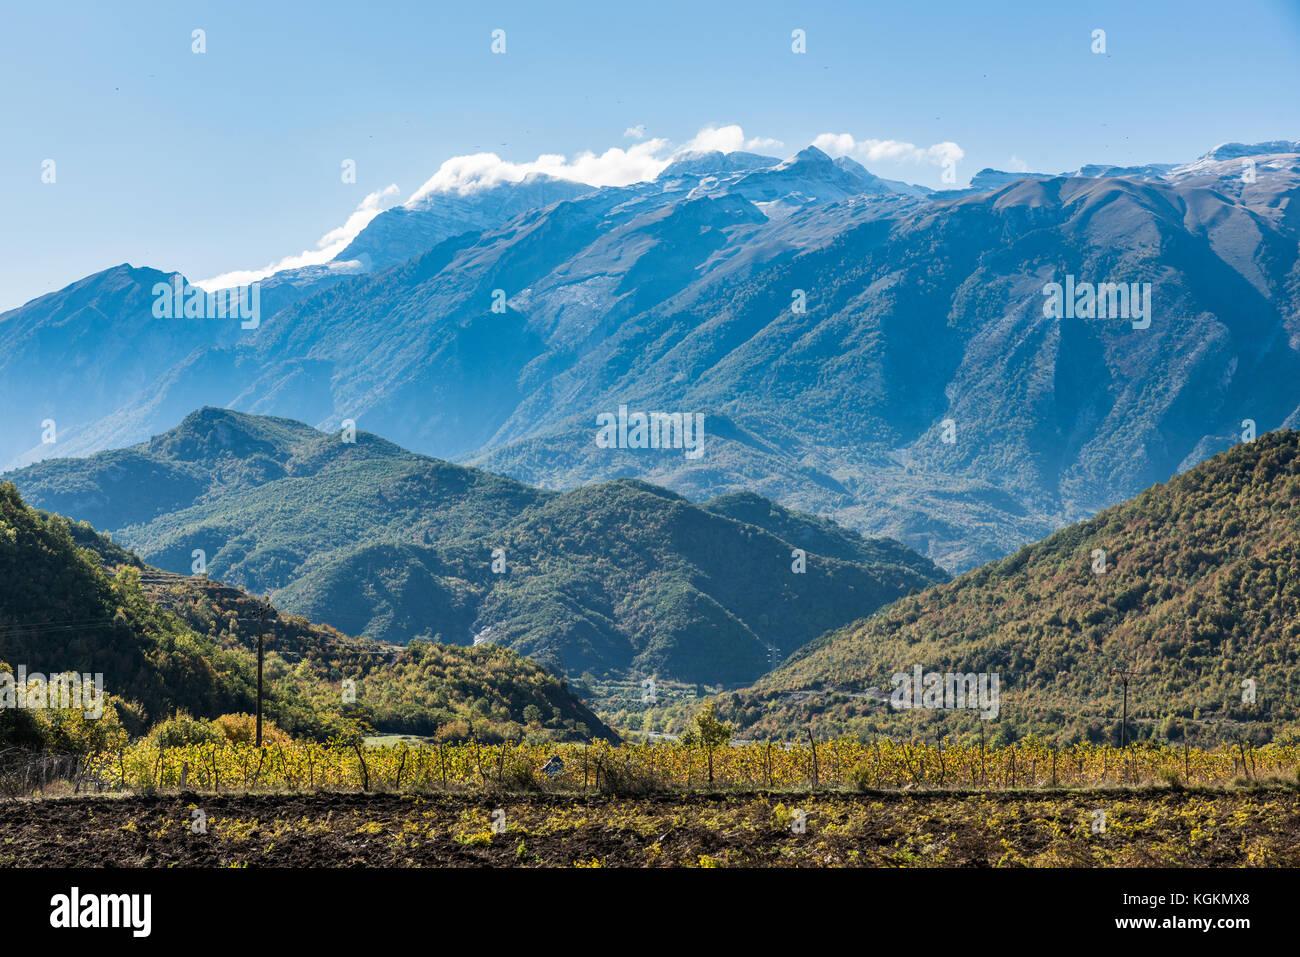 High mountains near Permet in Albania - Stock Image